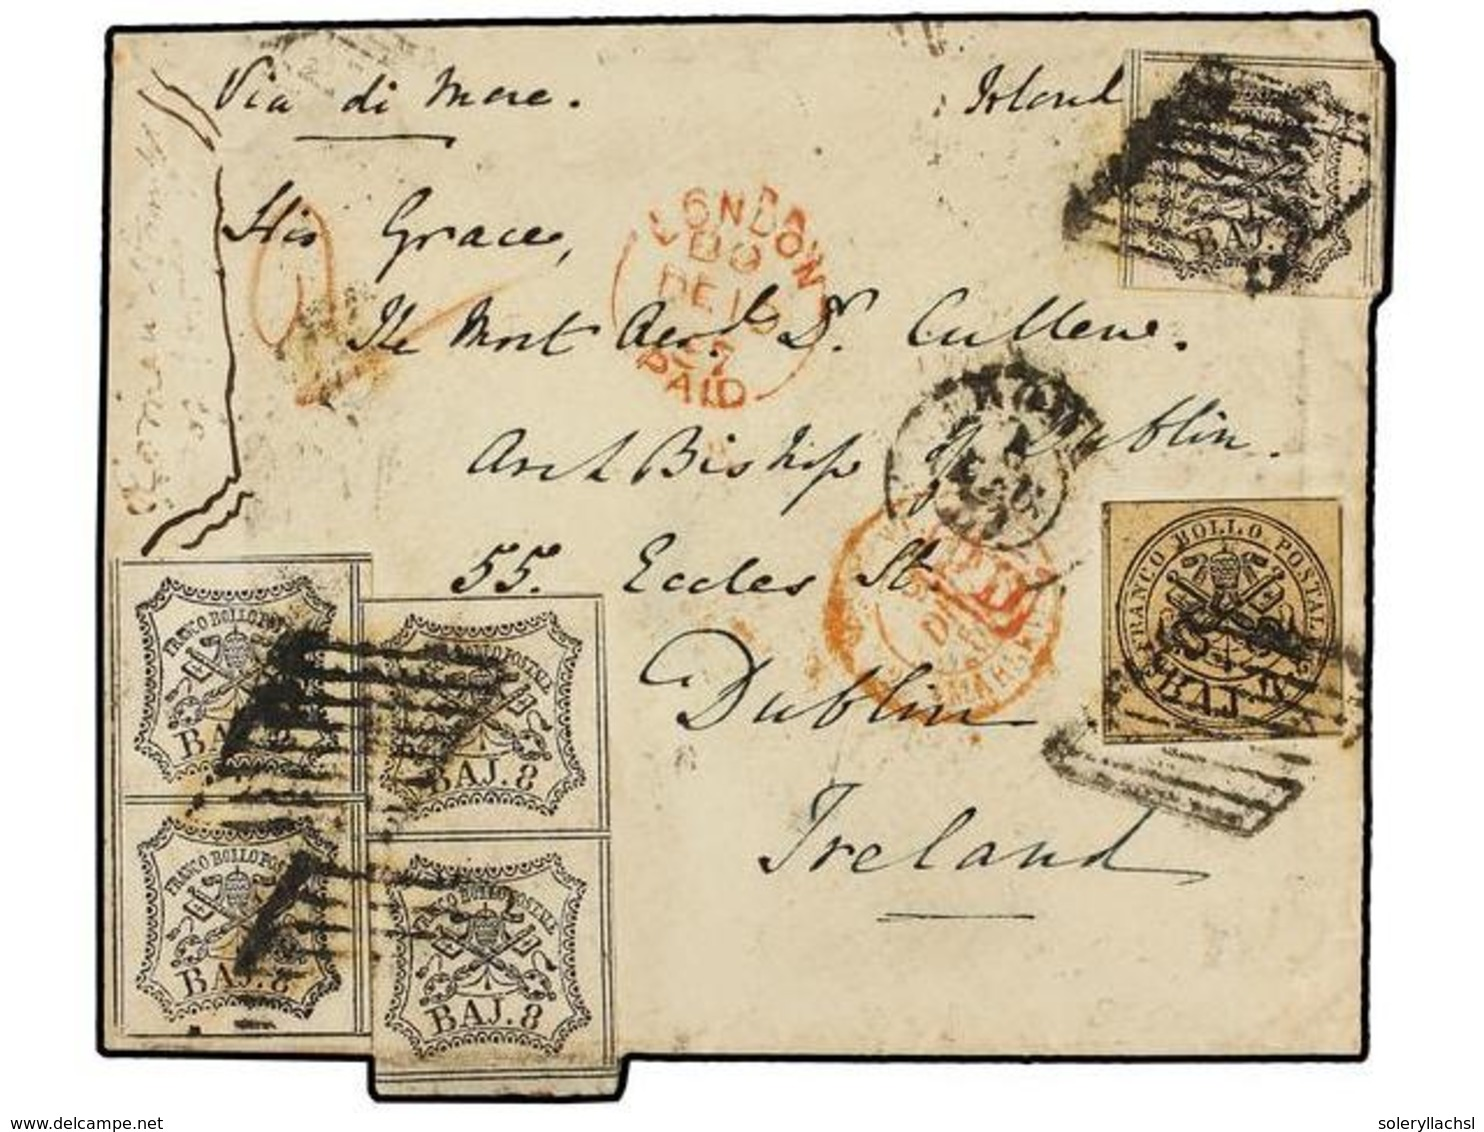 662 ITALIA ANTIGUOS ESTADOS: ESTADOS PONTIFICIOS. Sa.5, 9 (5). 1857. ROMA A DUBLÍN (Irlanda). <B>4 Baj.</B> Negro S. Ant - Stamps